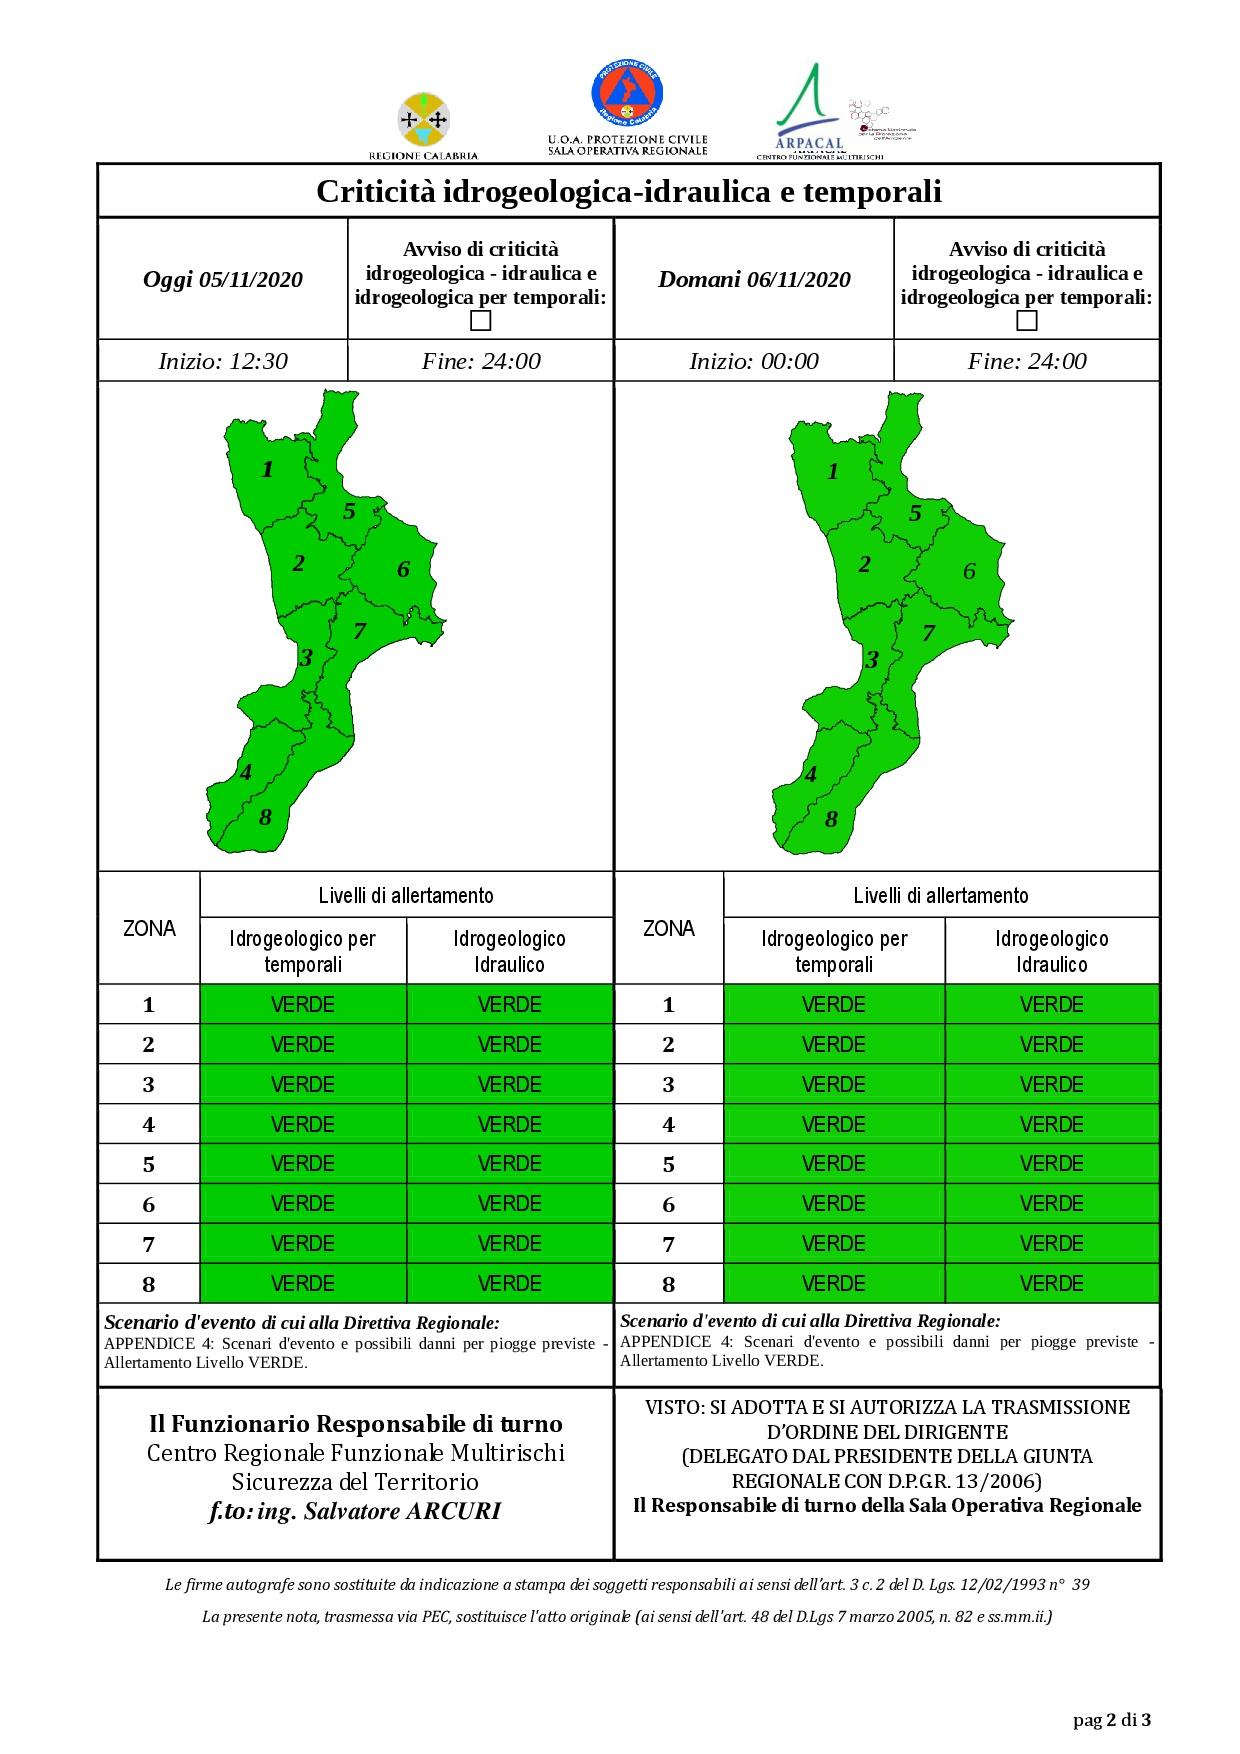 Criticità idrogeologica-idraulica e temporali in Calabria 05-11-2020